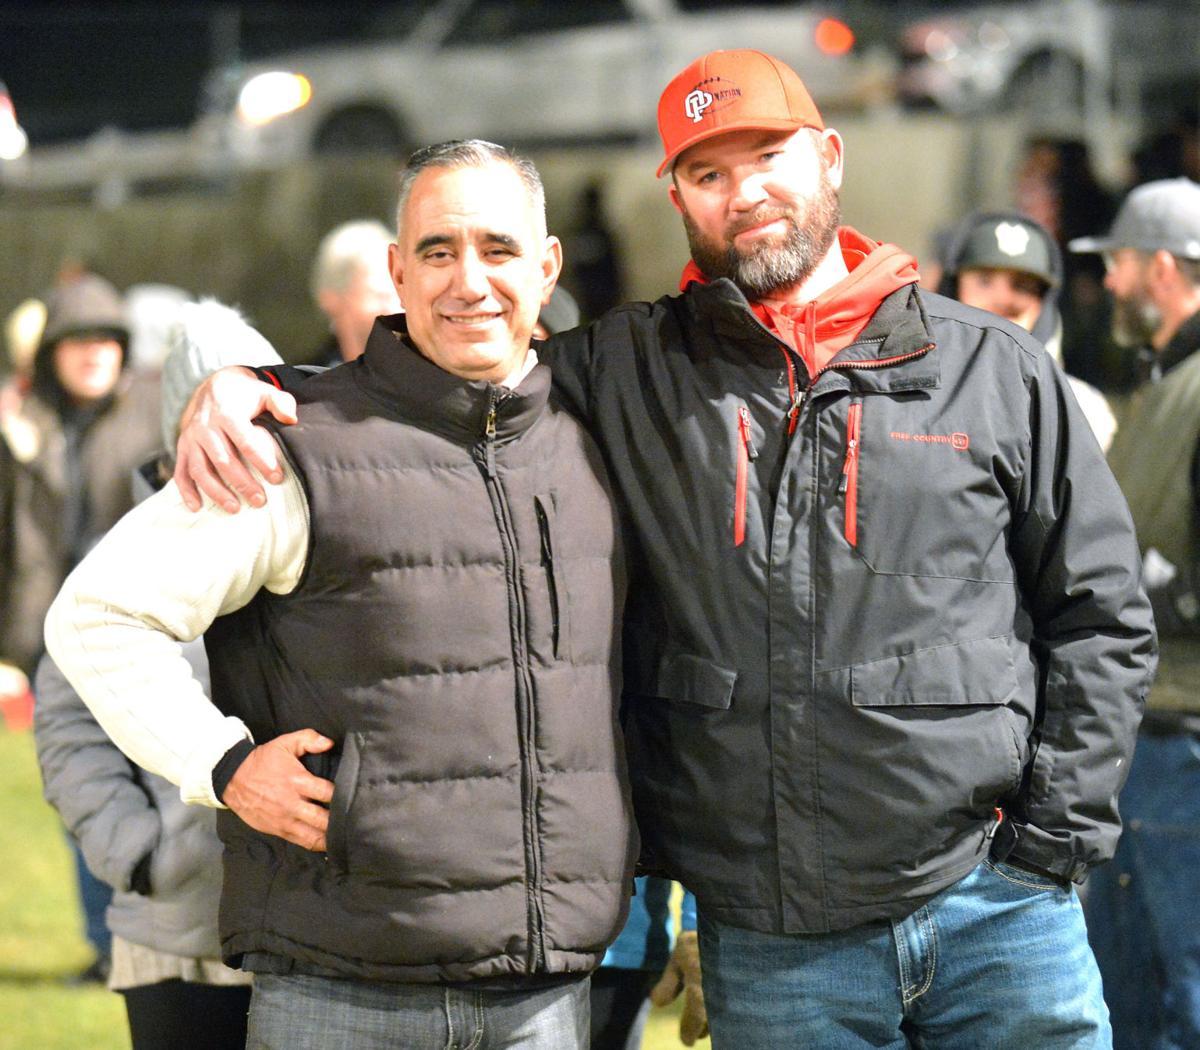 Hector Mendoza (left) and Jason Romine